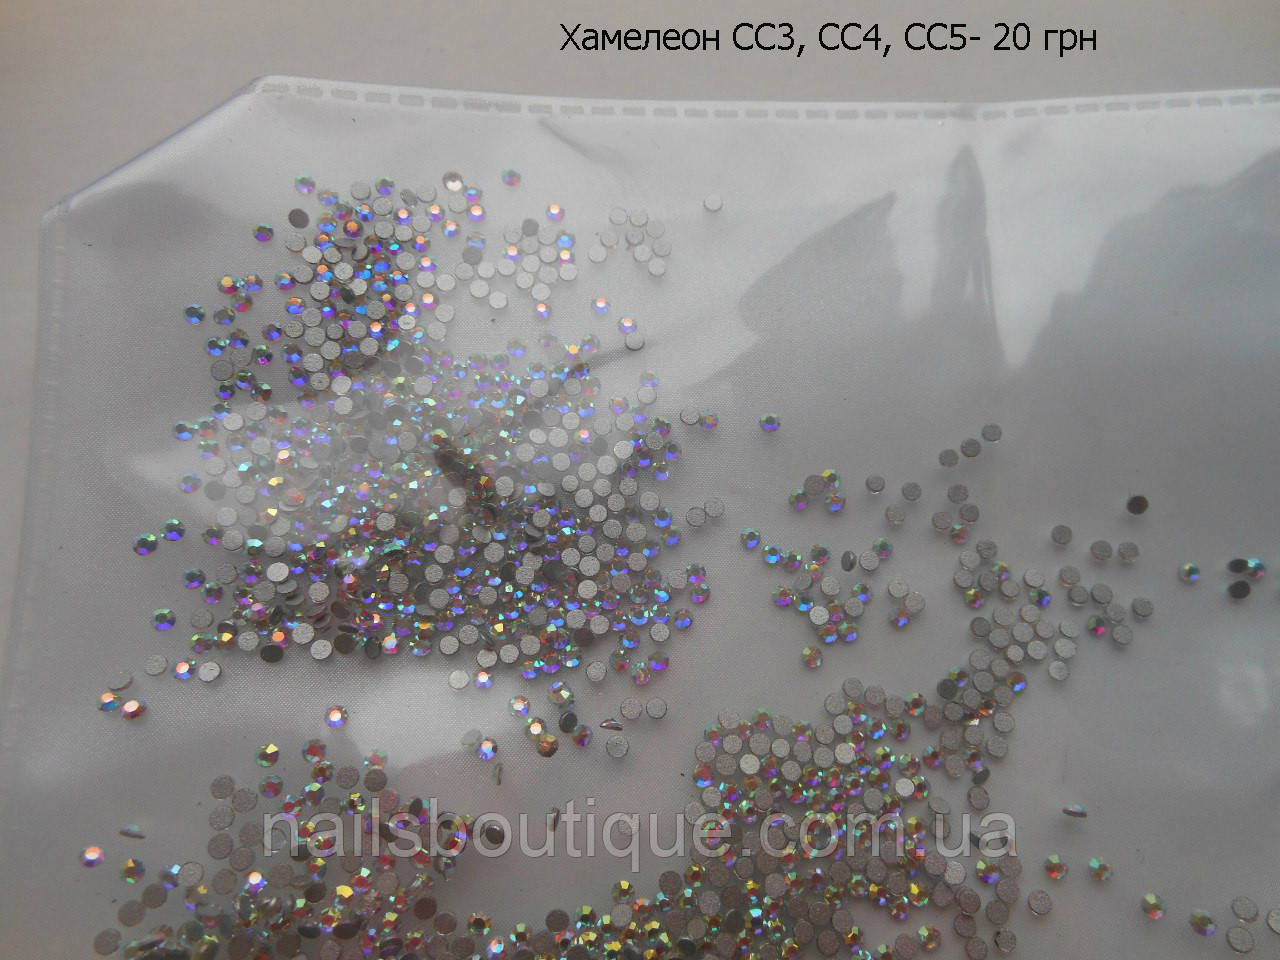 Стразы хамелеон, стекло, размер СС4 (1,3мм), 100шт